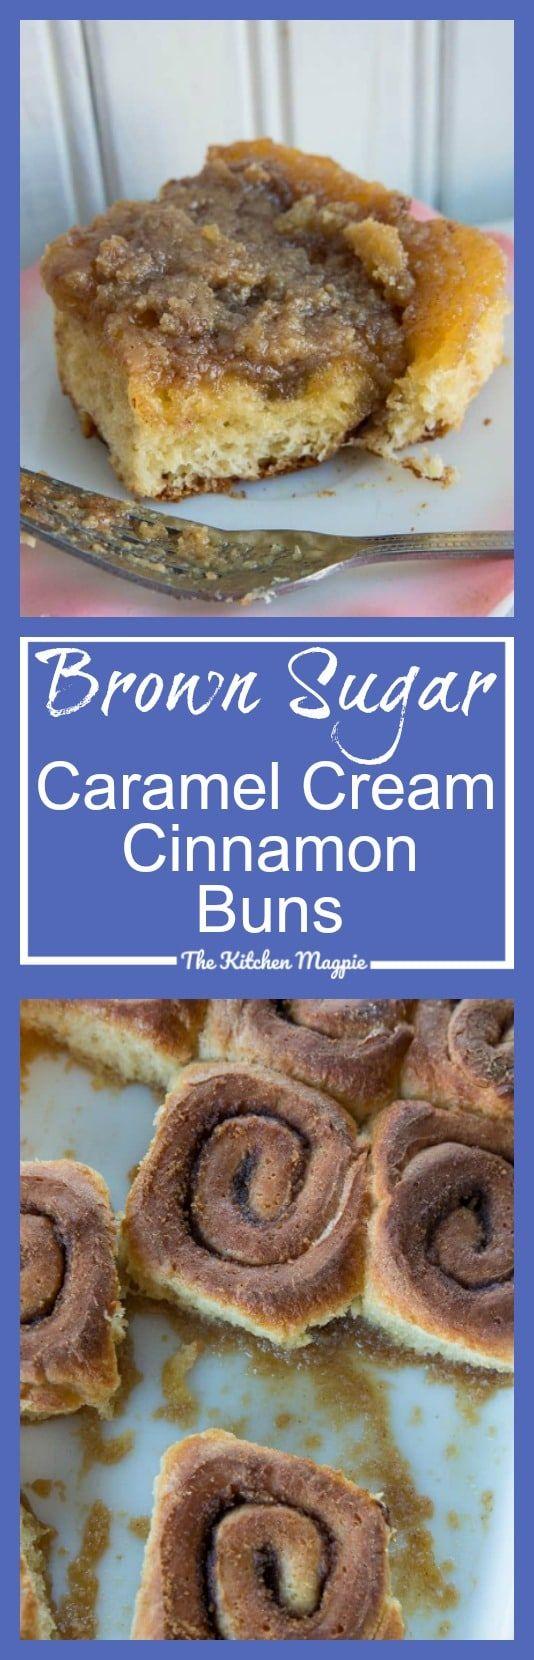 Brown Sugar Caramel Cream Cinnamon Buns - The Kitchen Magpie